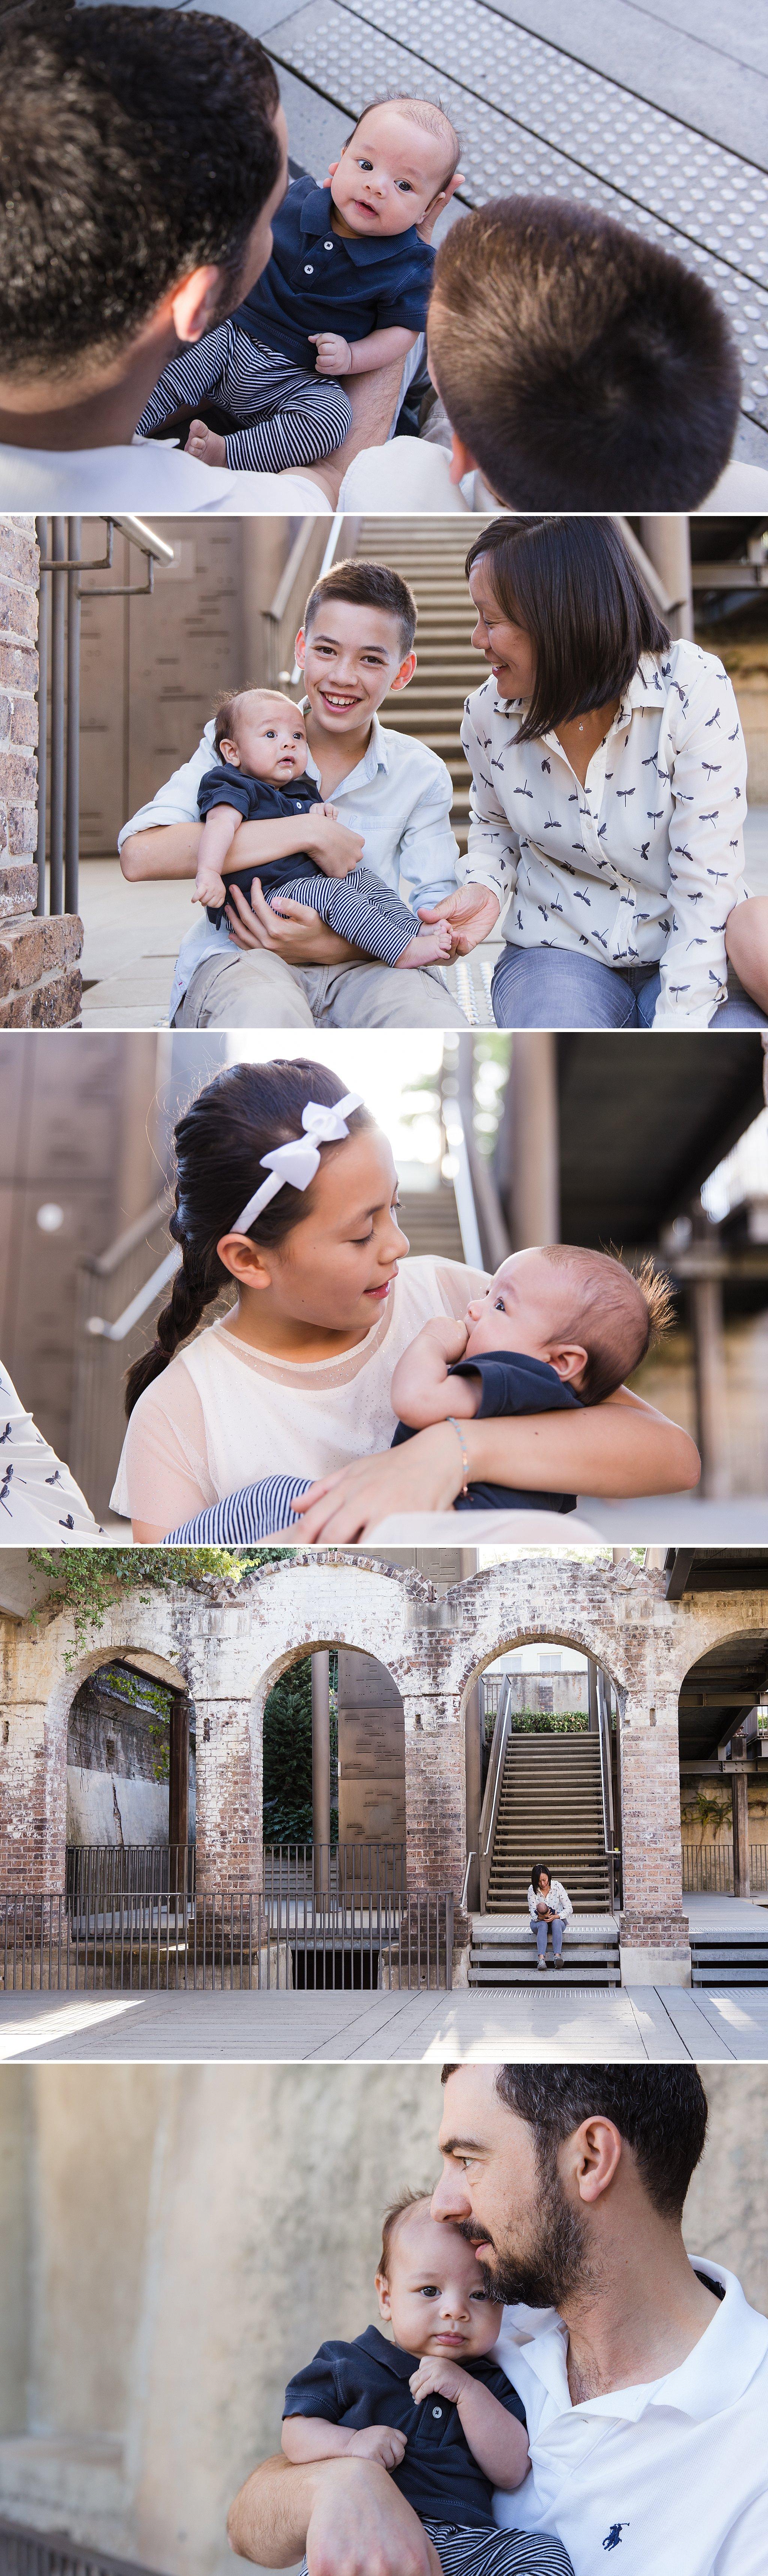 Sydney Family Photography_0005.jpg